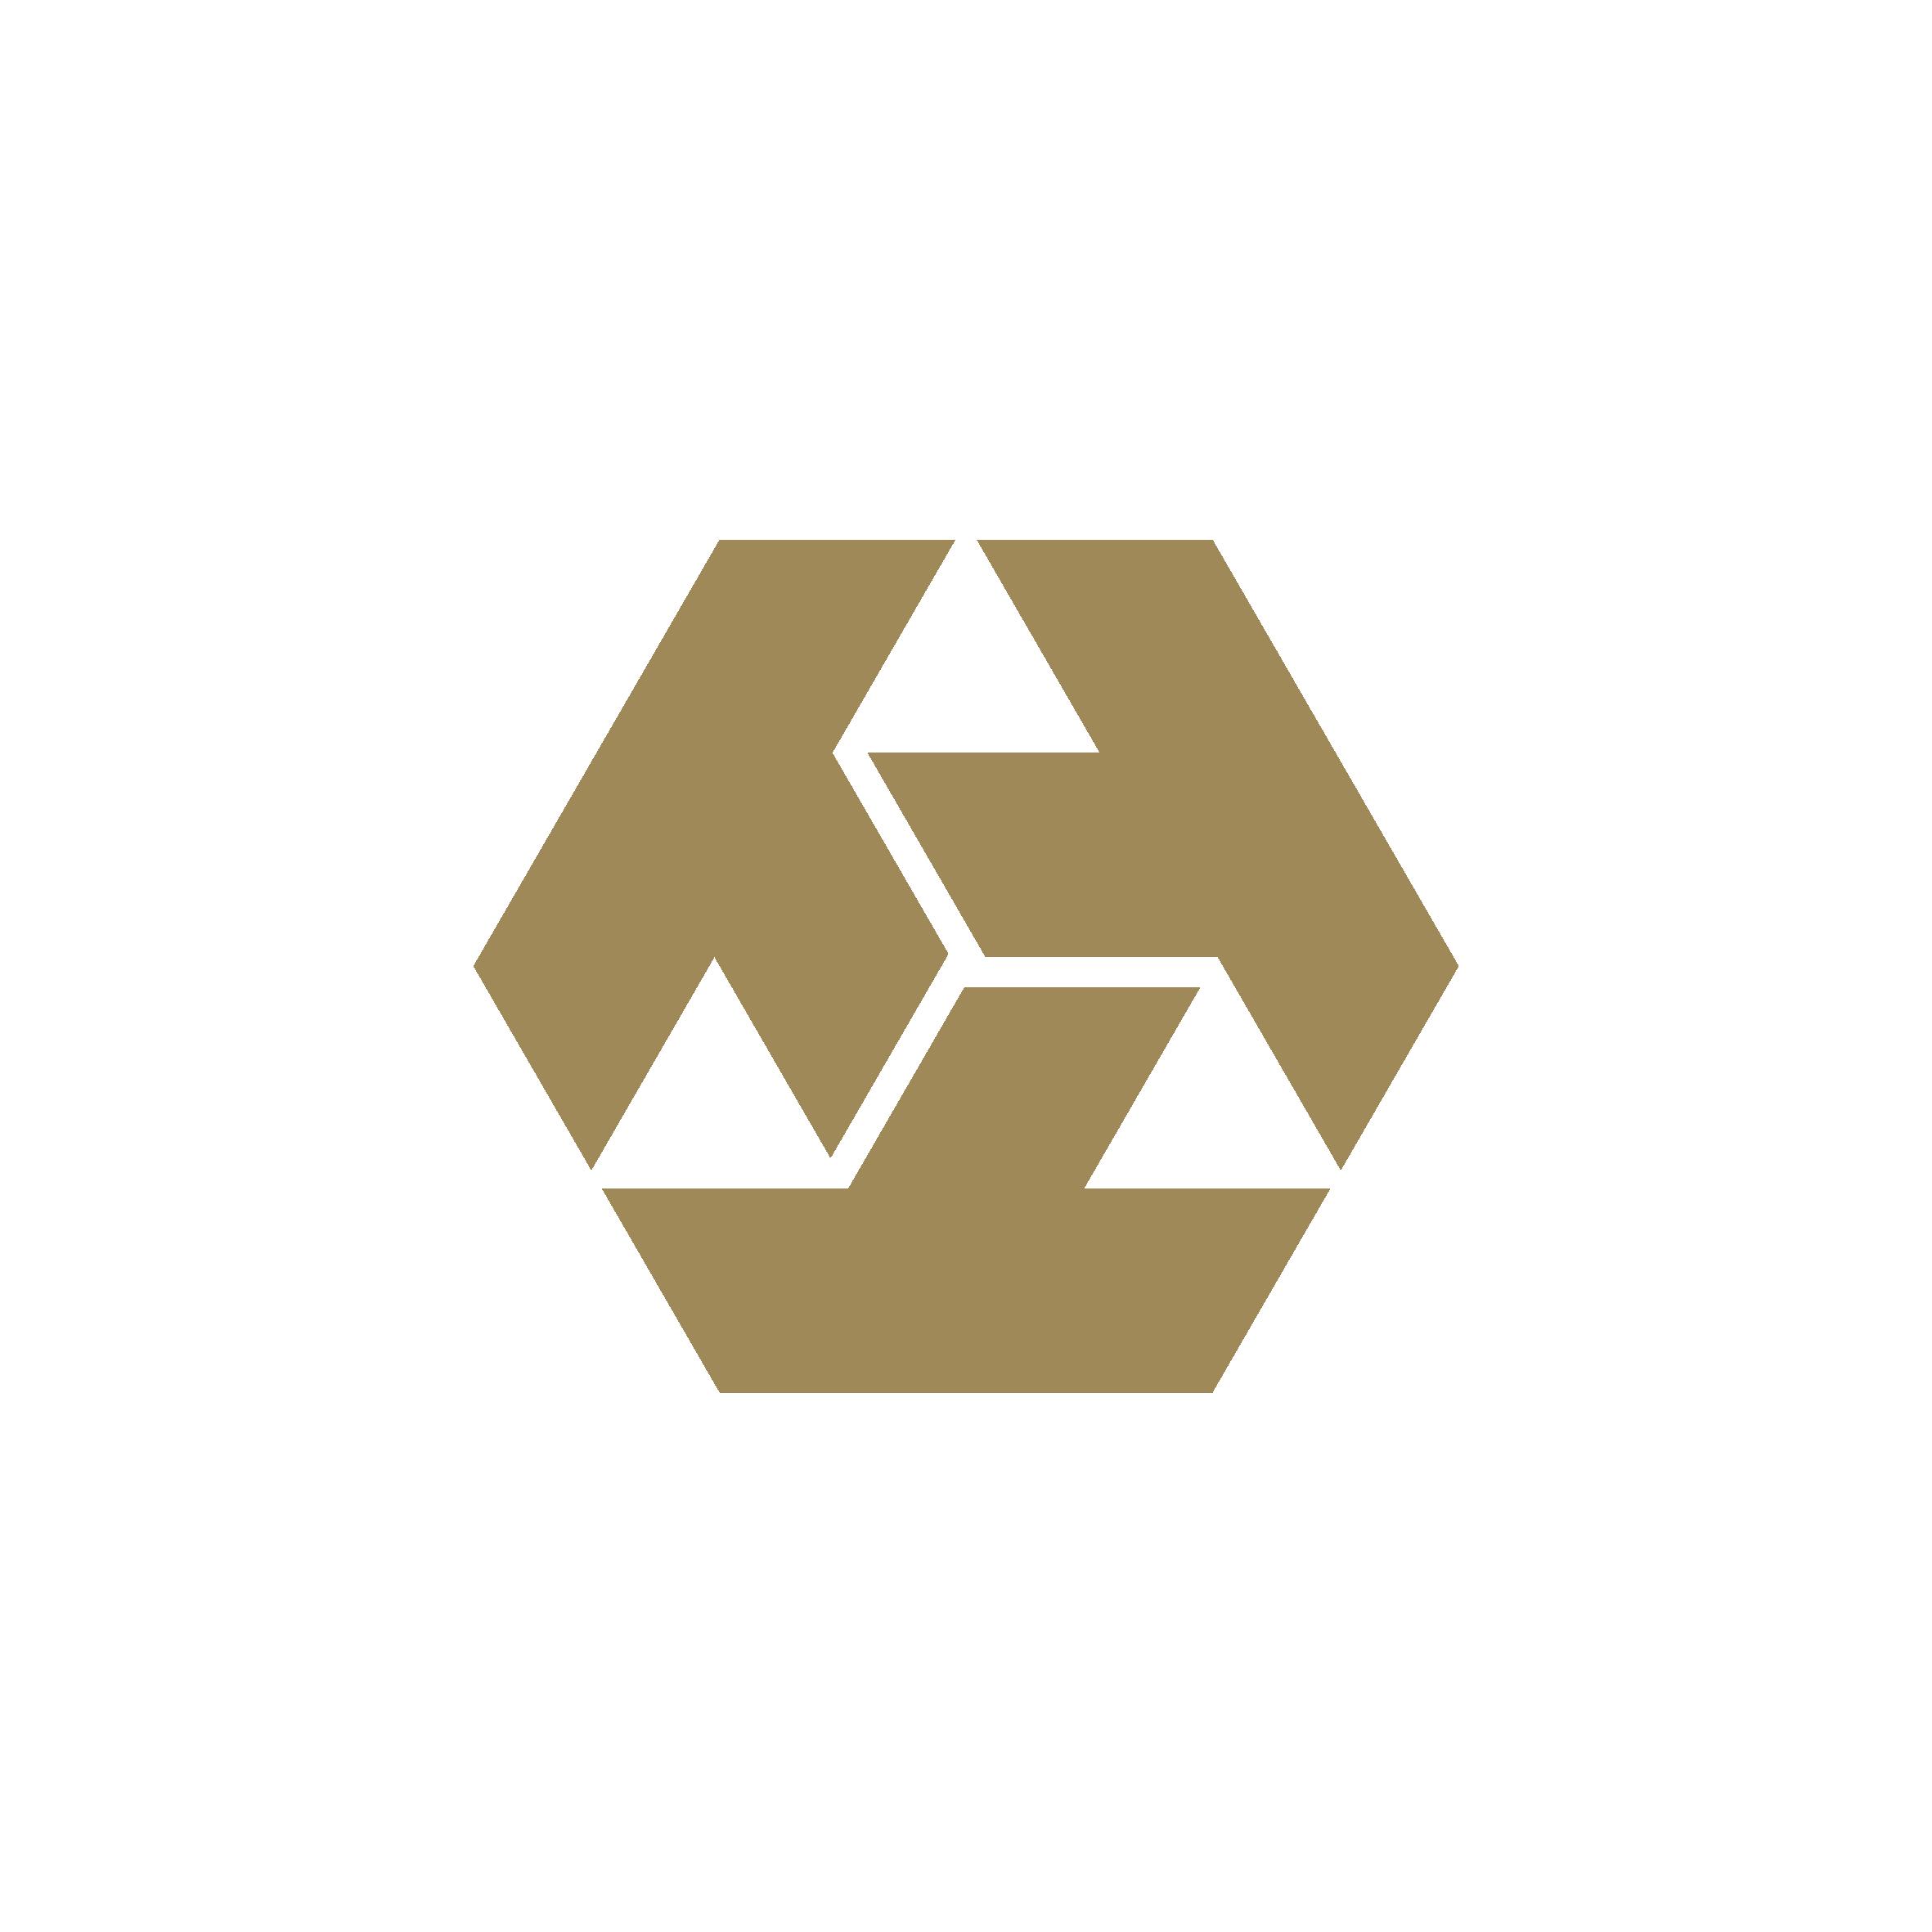 turn icon